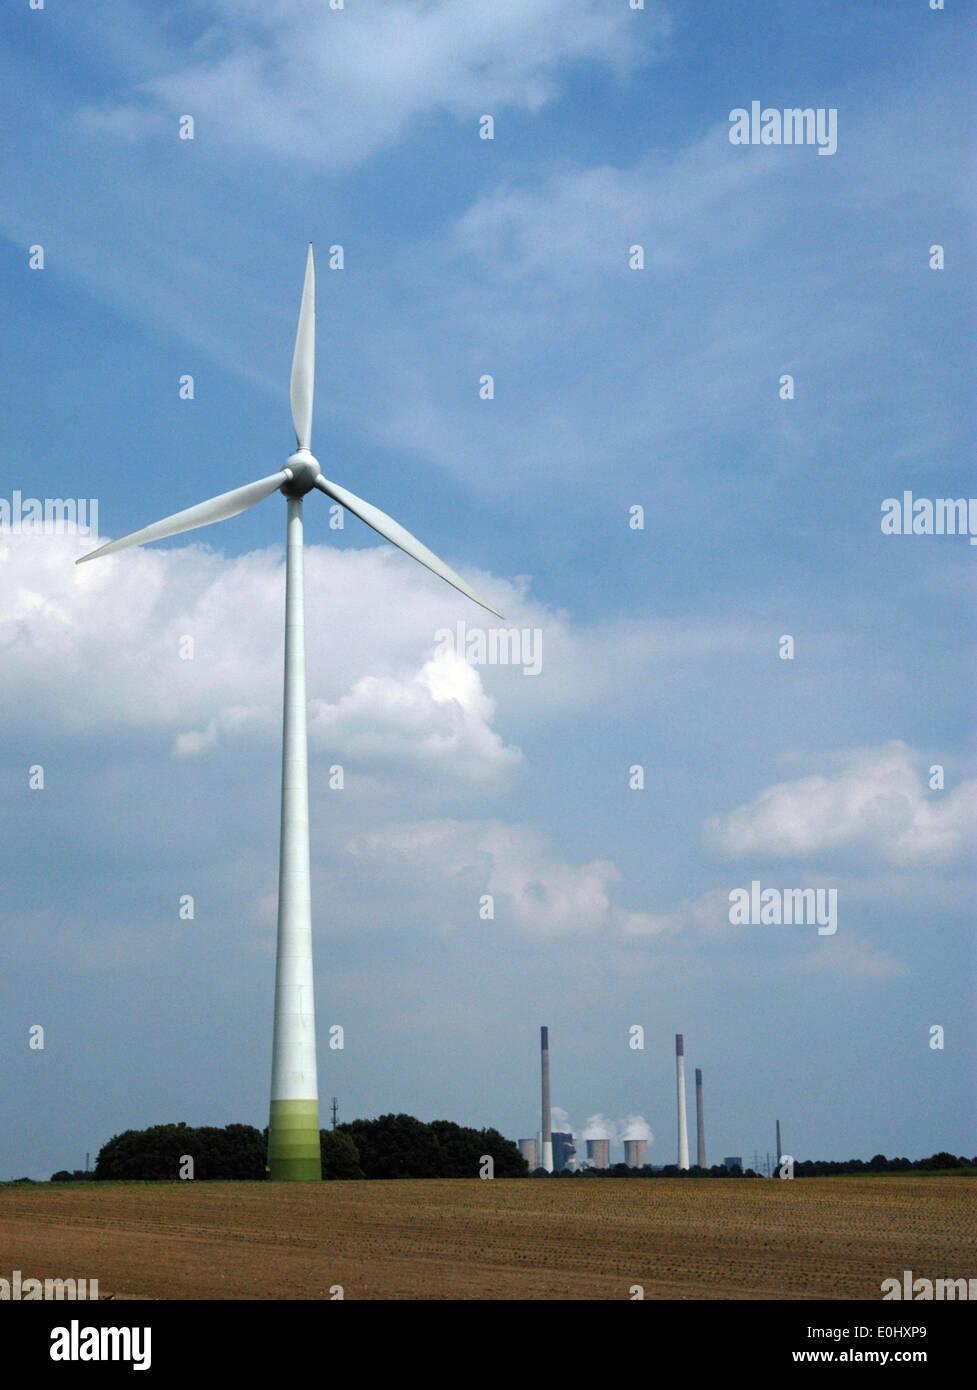 Germany, near Cologne, wind energy, wind turbine, Deutschland, nahe Köln, Windenergie, Windturbine - Stock Image